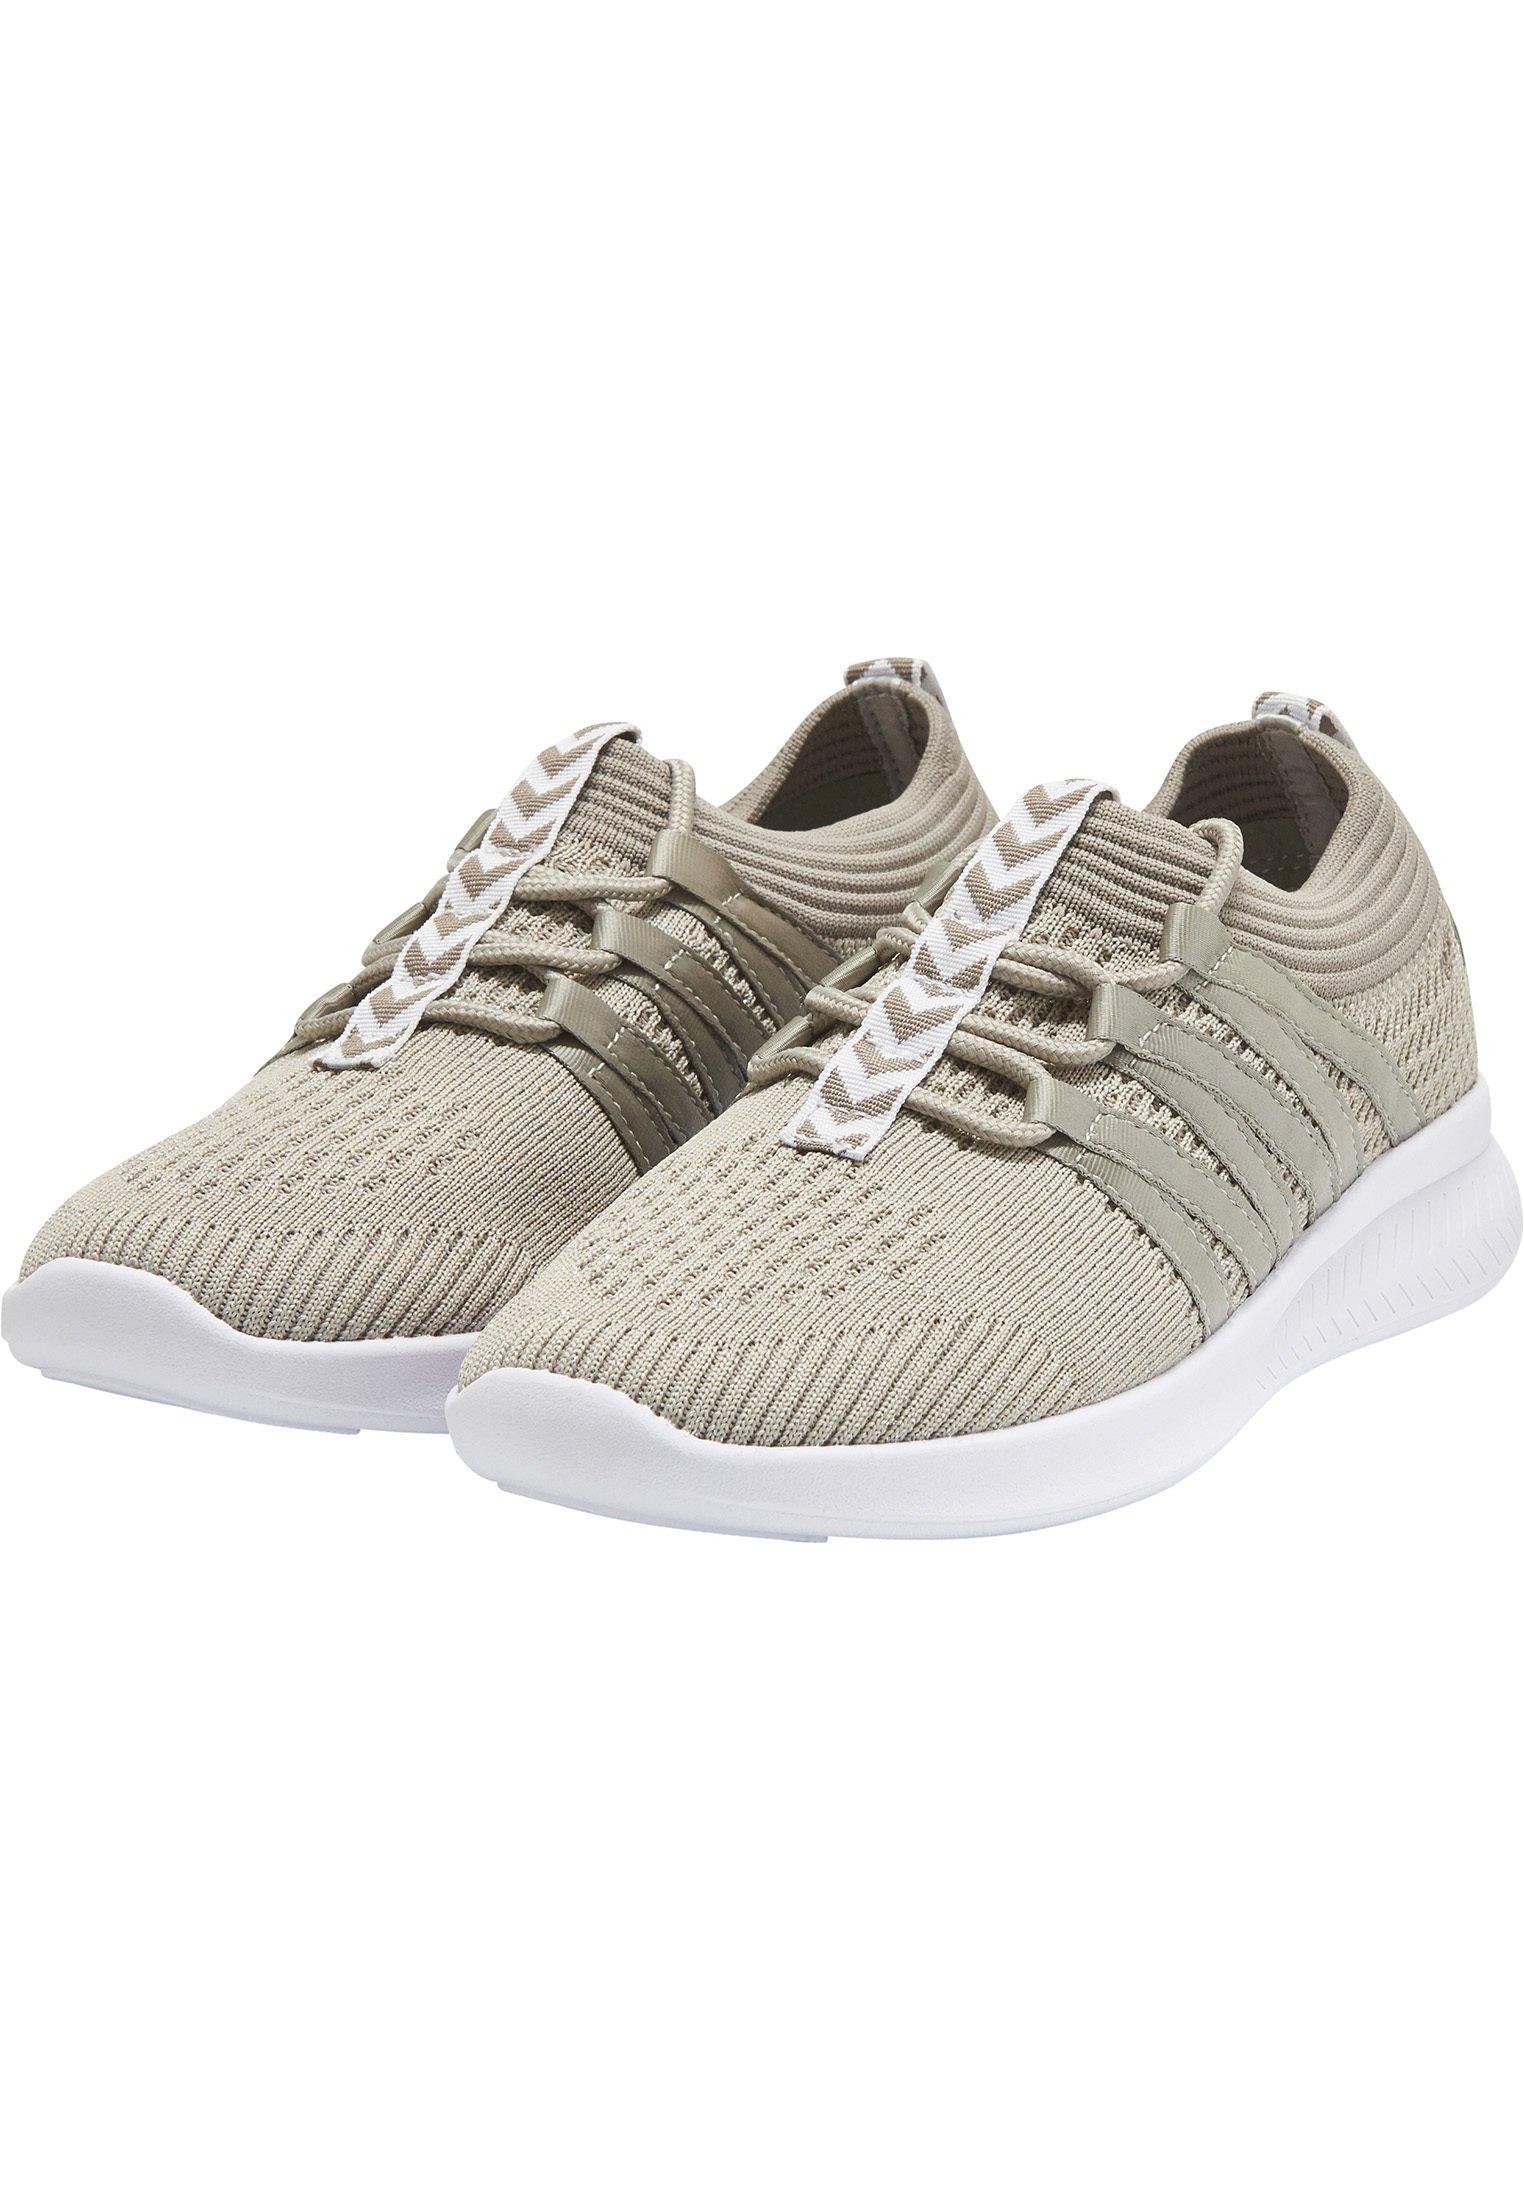 TRIM Sneakers silver cloud